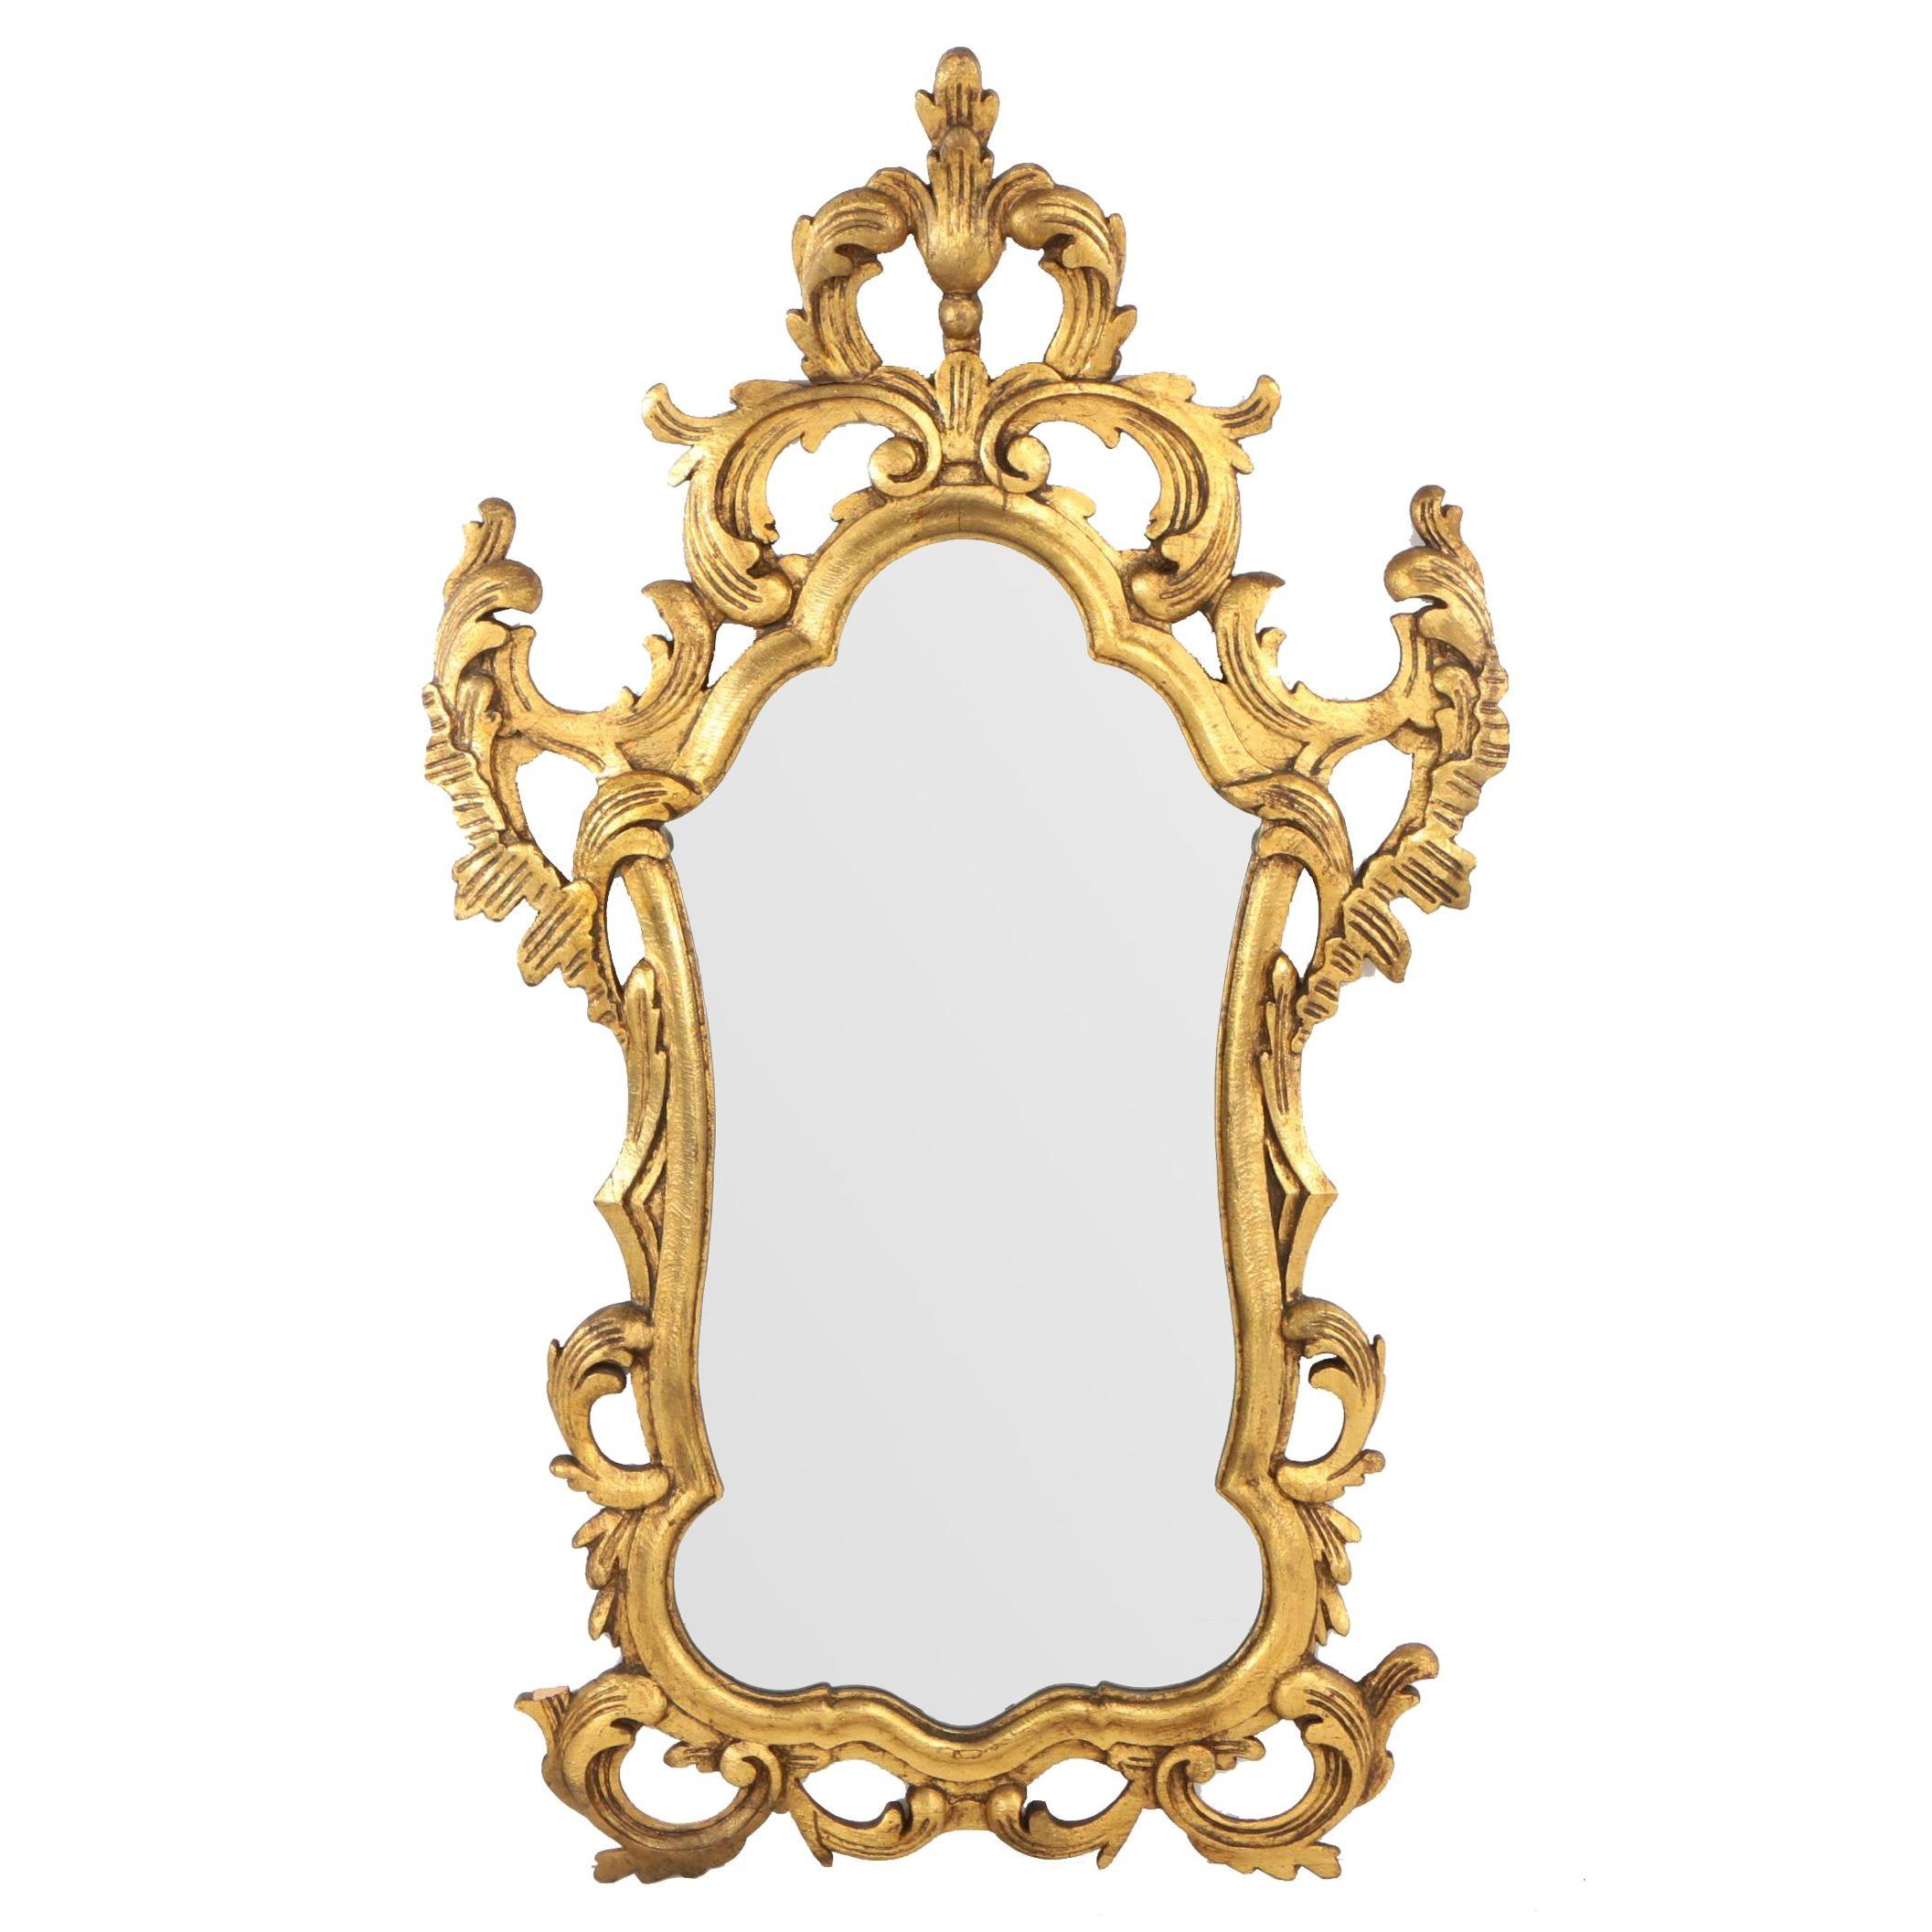 Francisco Hurtado Spanish Baroque Style Carved Giltwood Mirror, Mid 20th Century